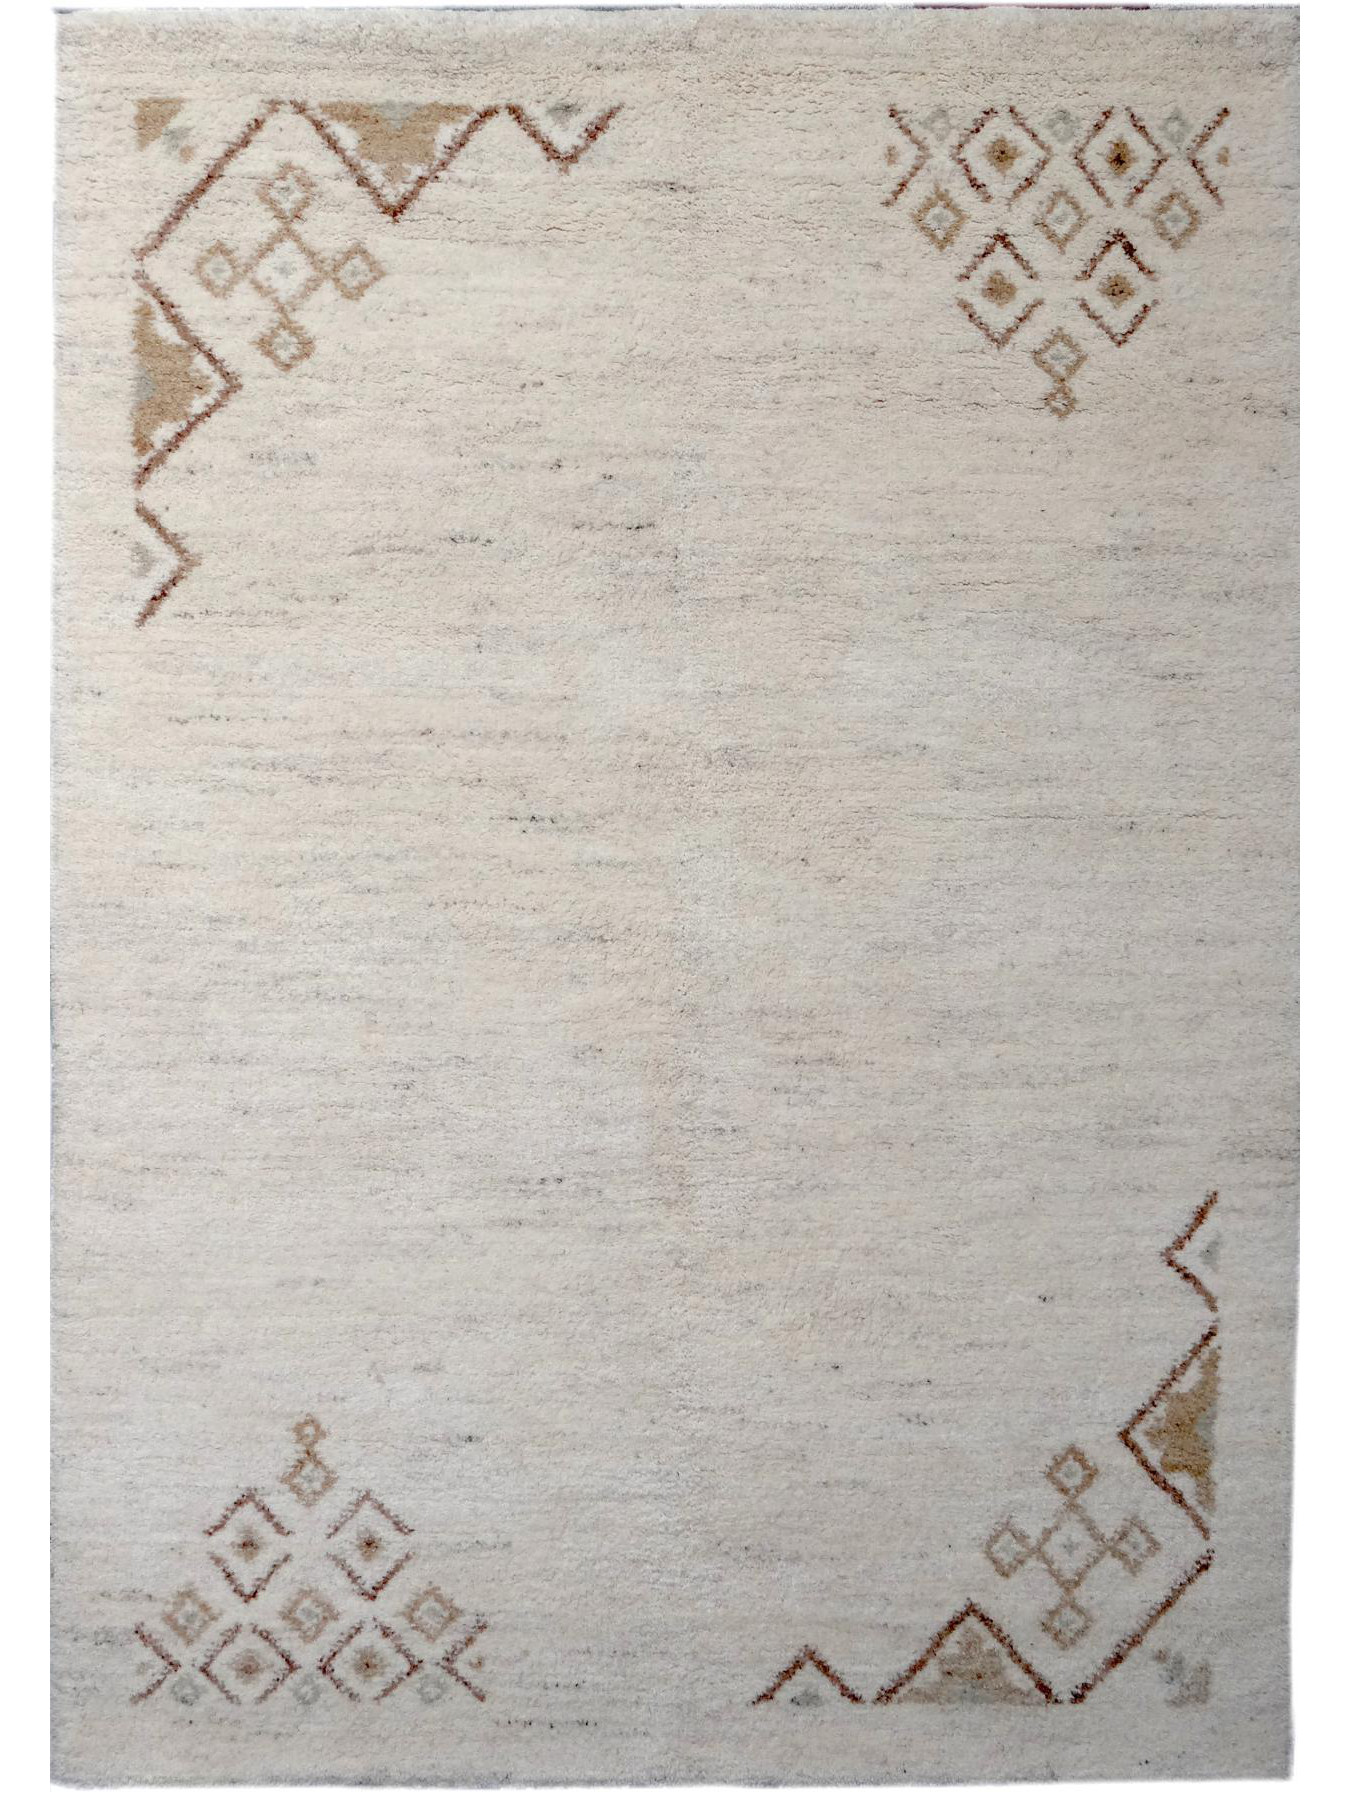 Berber tapijten - ATLAS 2 - 221